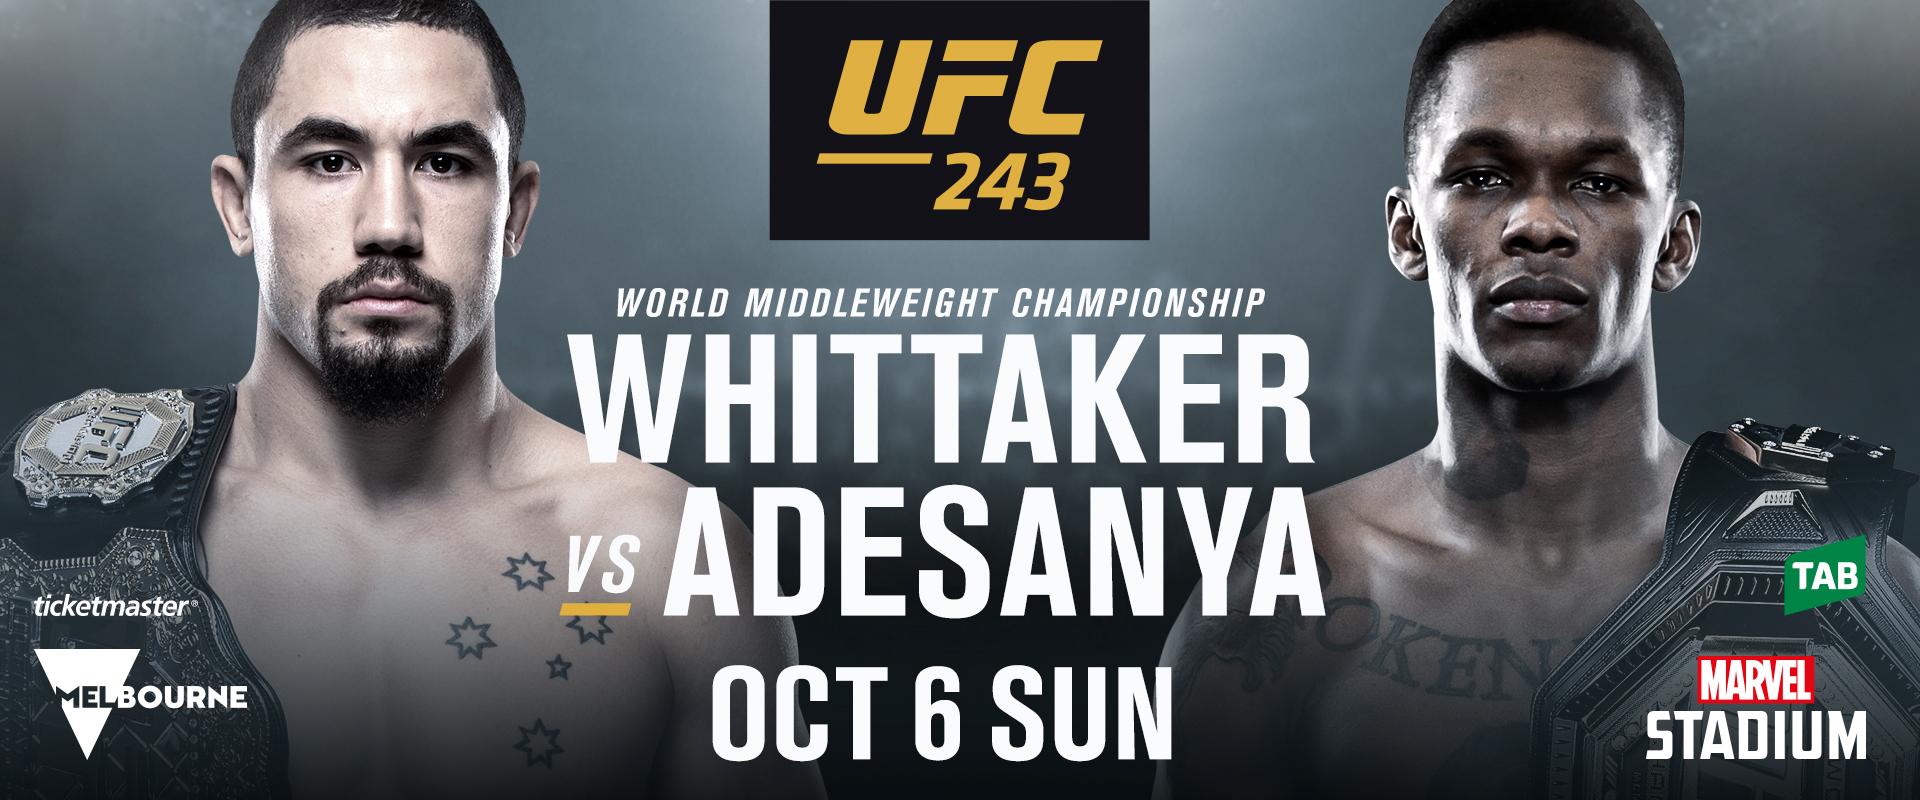 UFC 243 | UFC